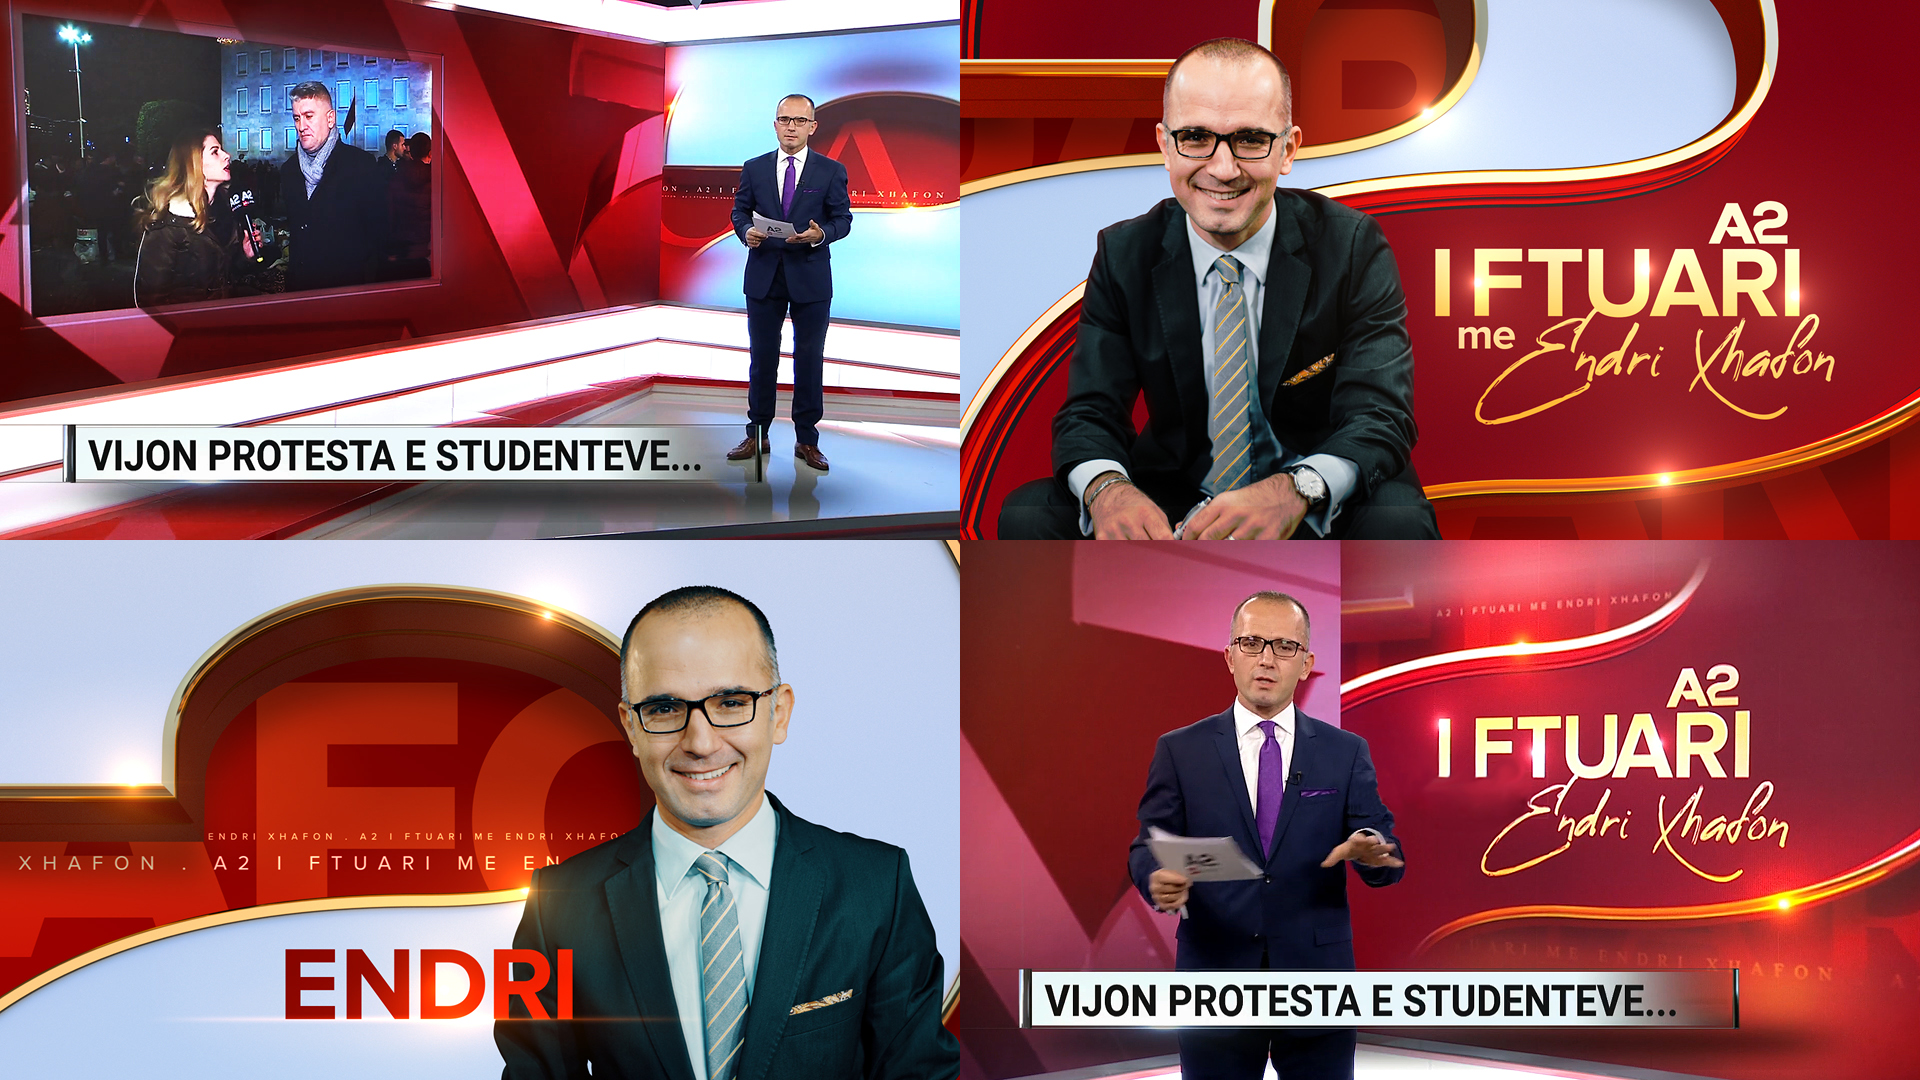 I_Ftuari_A2_CNN_Renderon_03.jpg